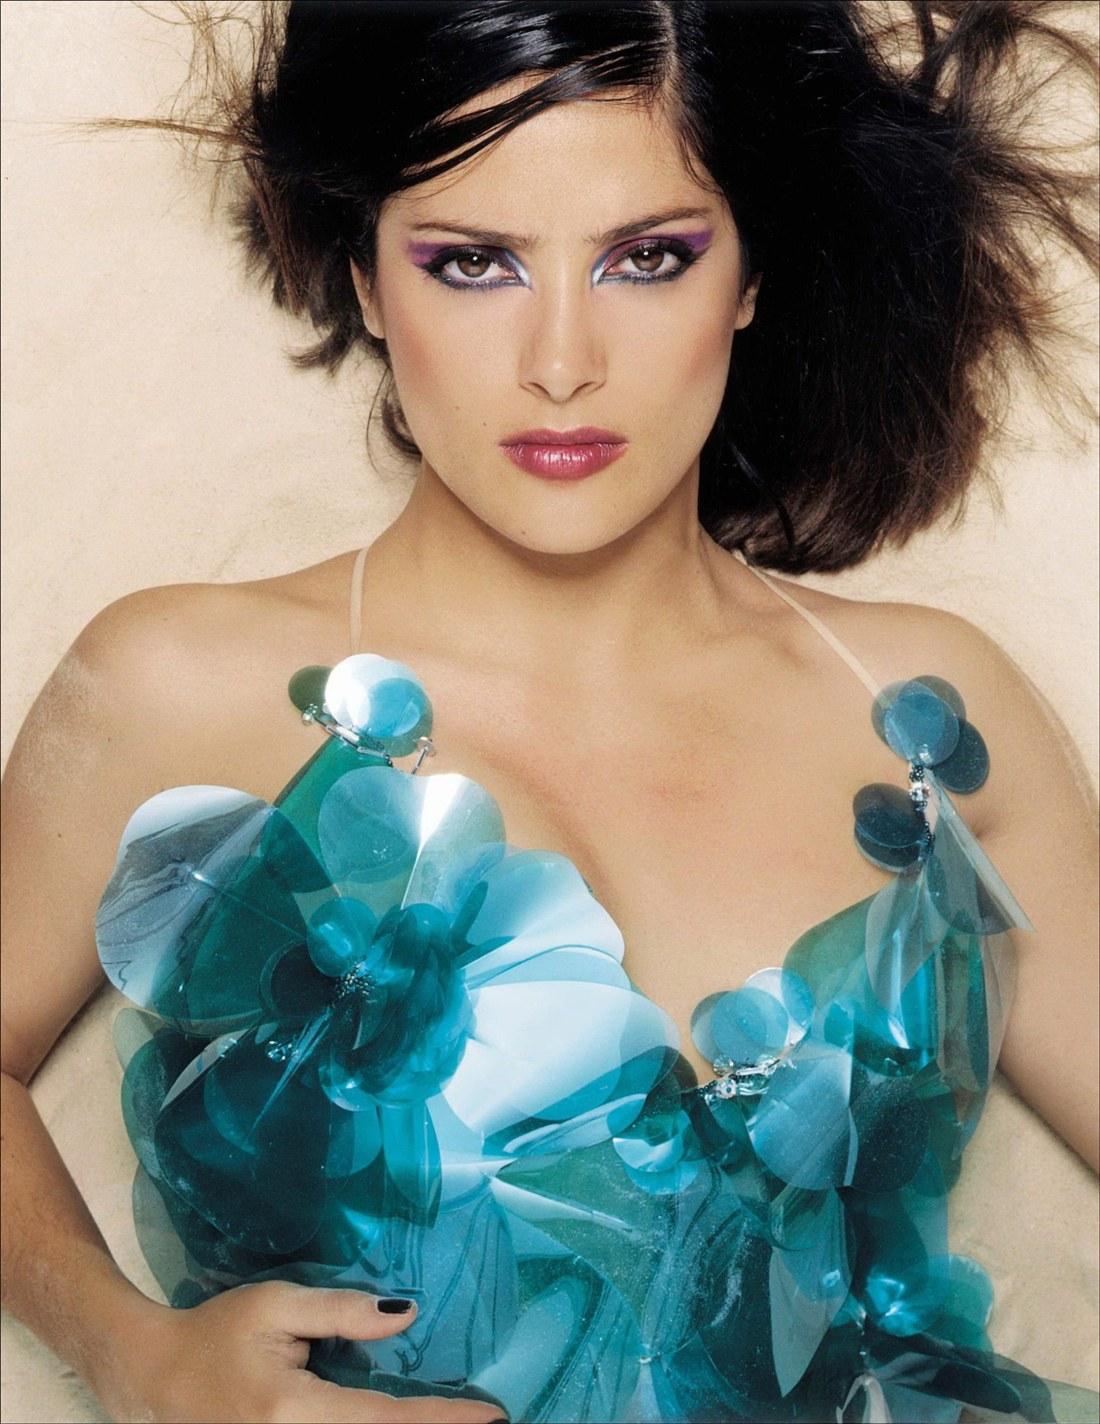 salma hayek nude photoshoot